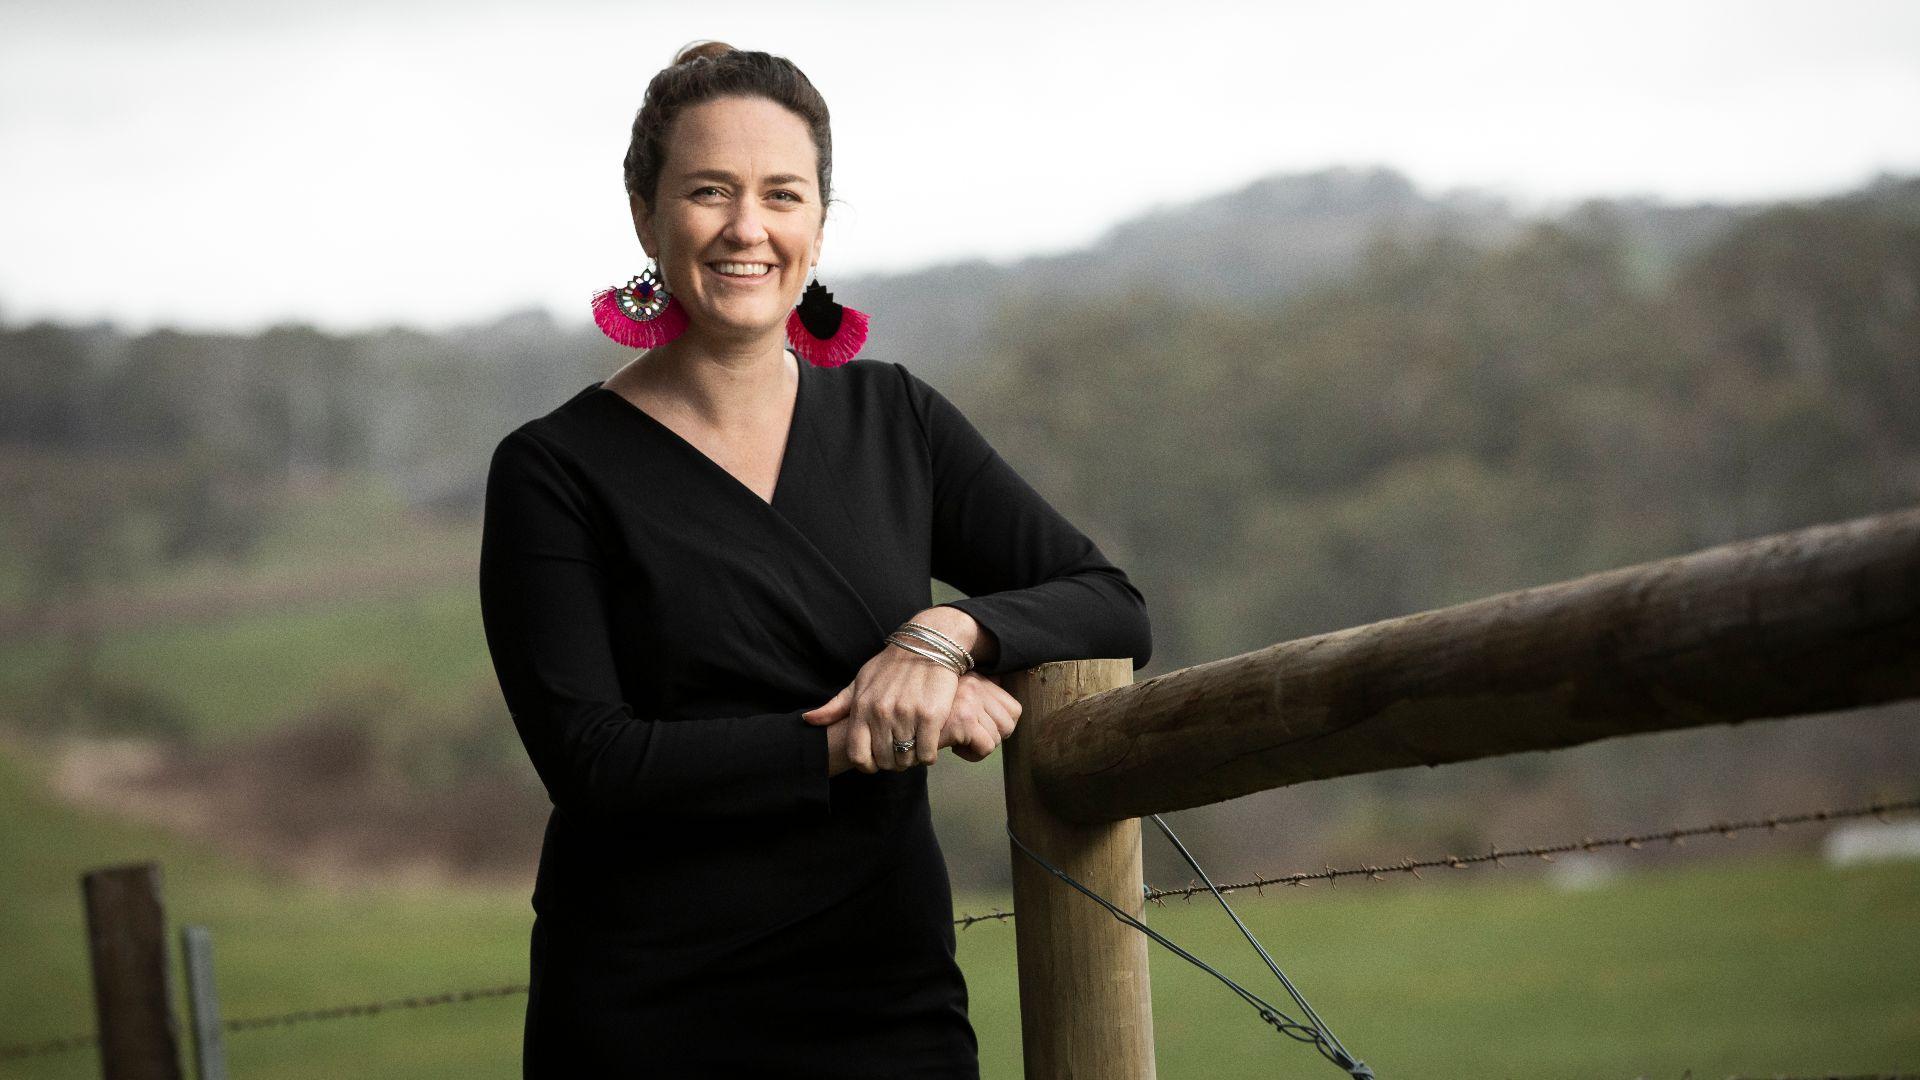 Charles Sturt alumna salutes region's fierce females ahead of International Day of Rural Women